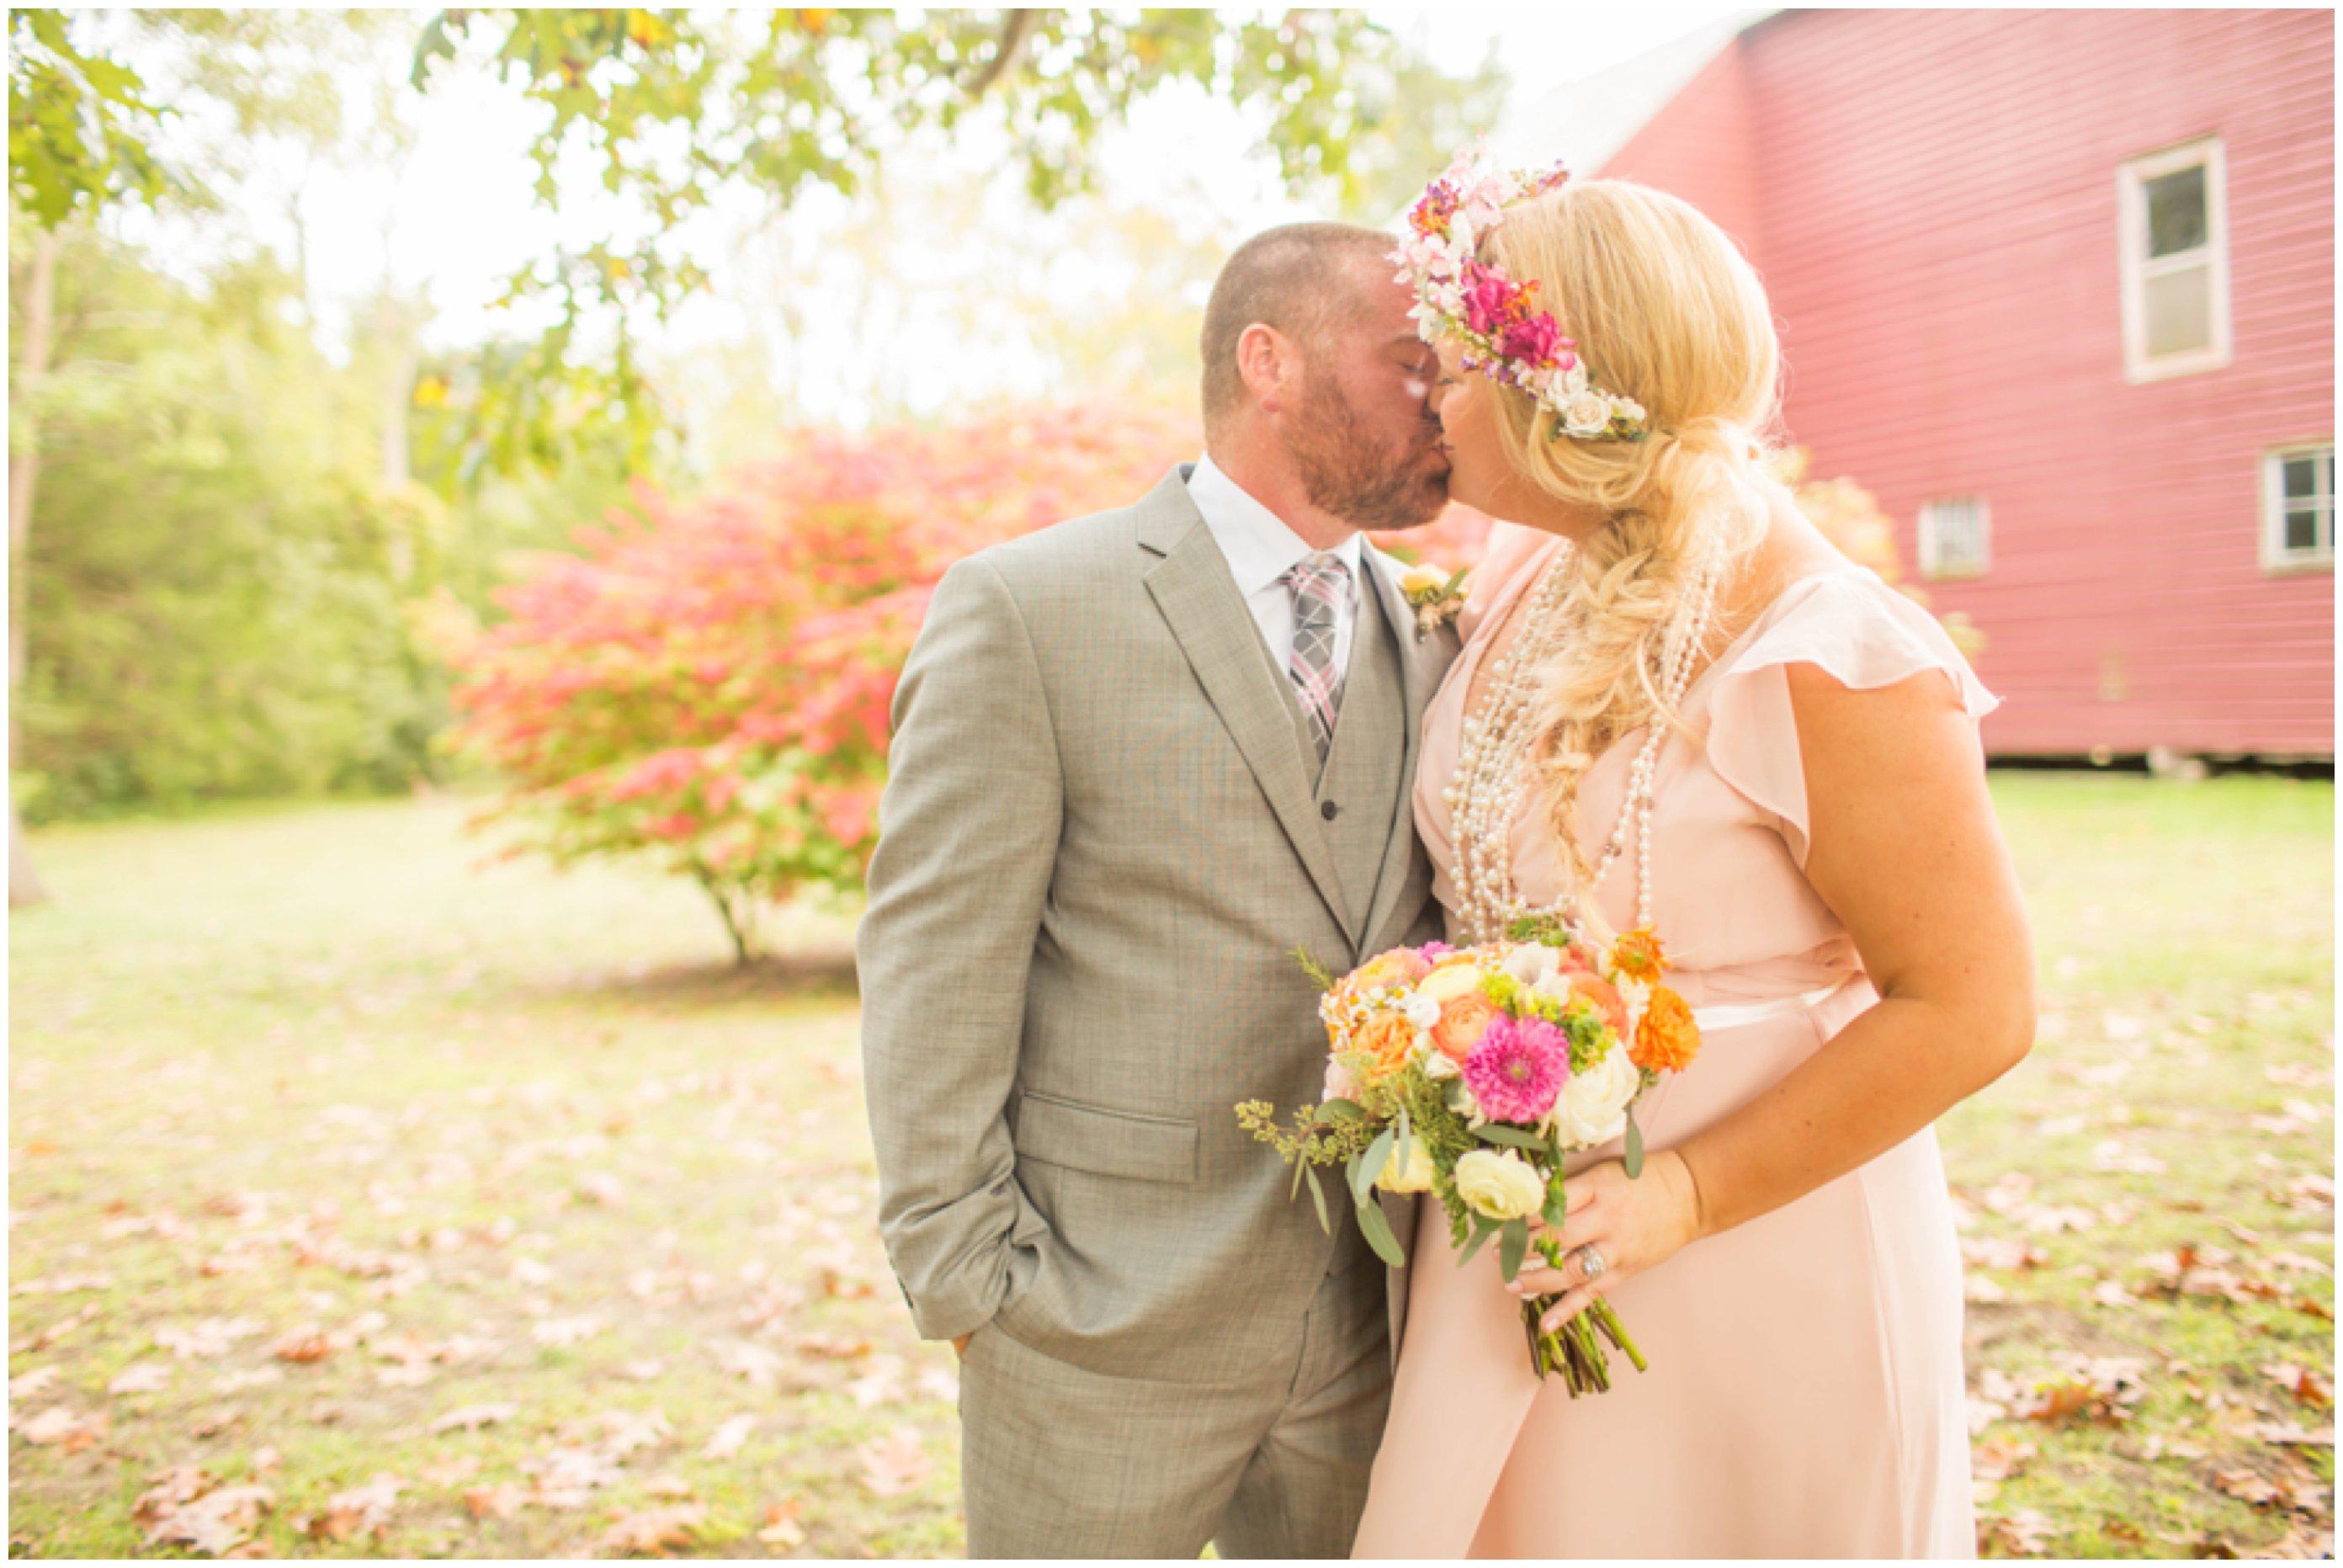 Wedding Photographers Nj Kaitlin Noel Photography